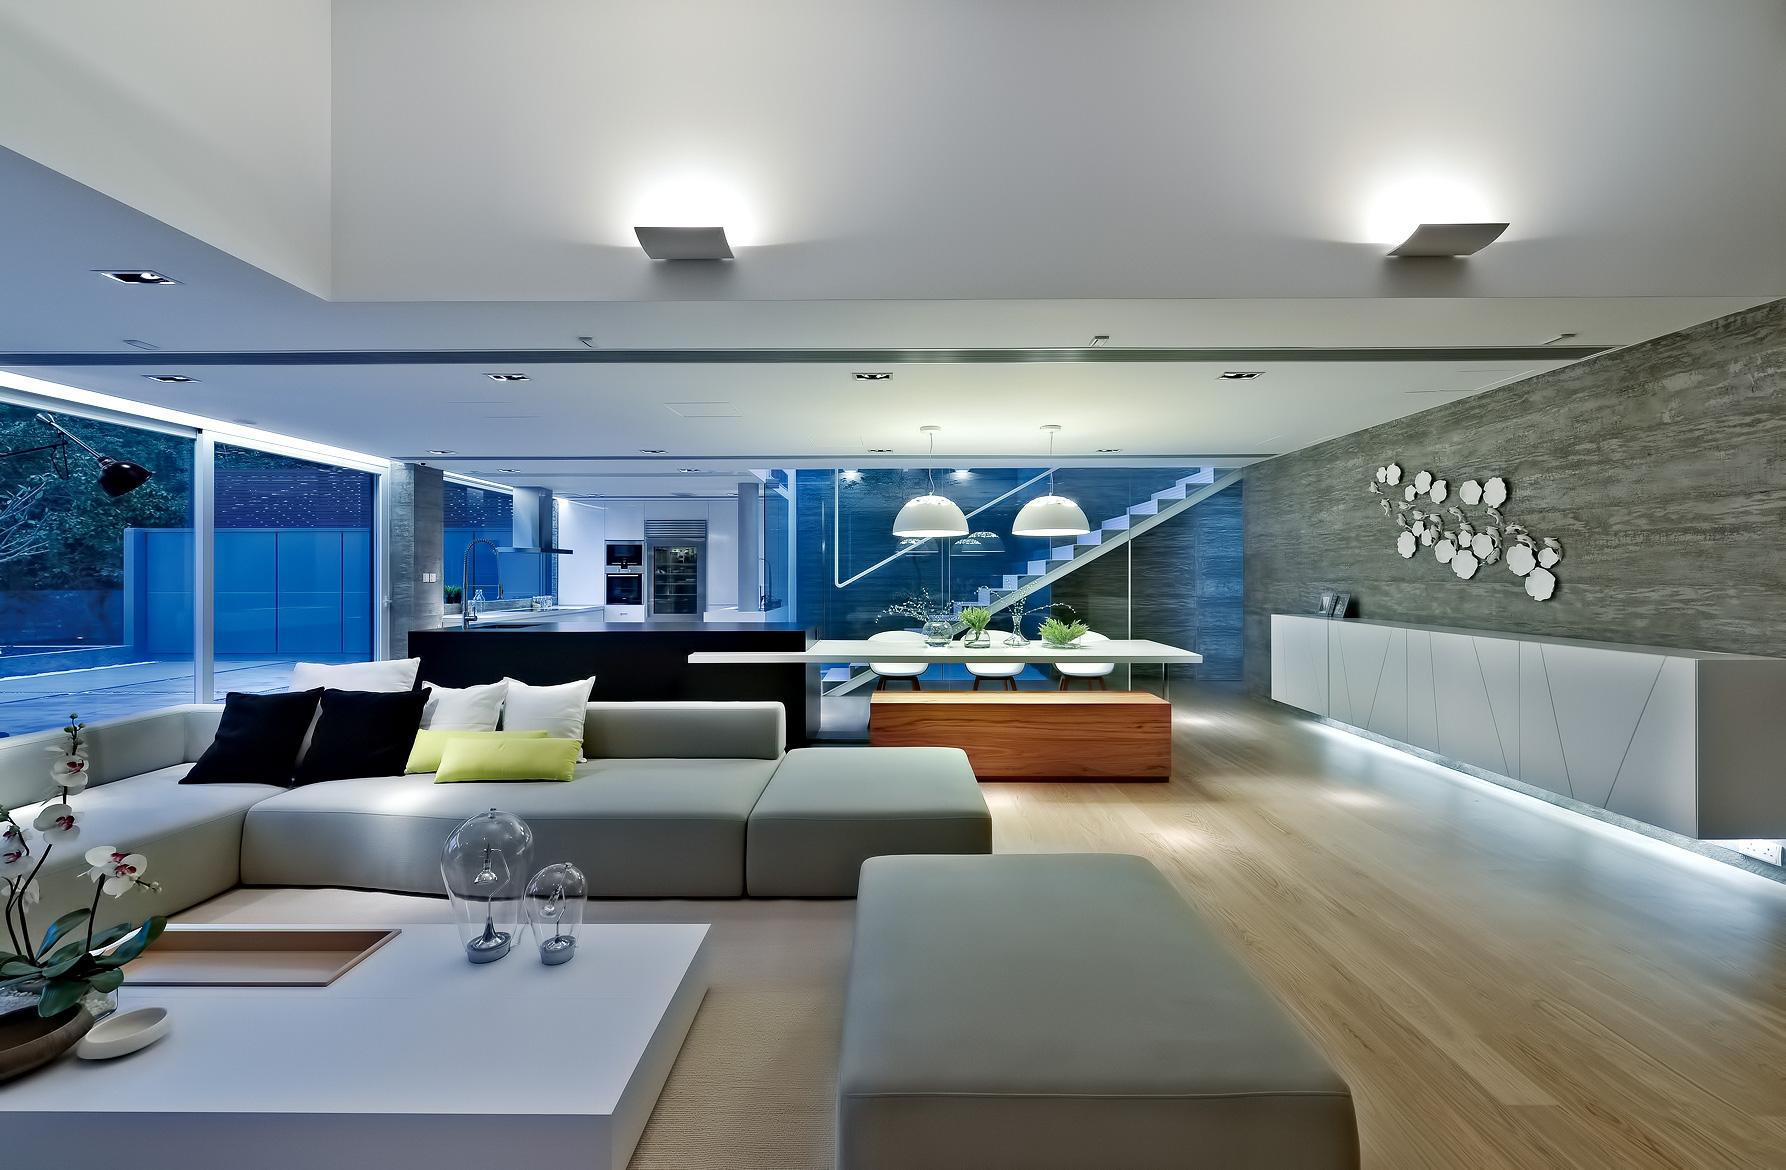 Sha Tin, New Territories, Hong Kong 🇭🇰, China 🇨🇳 – Luxury Homes – Showcase